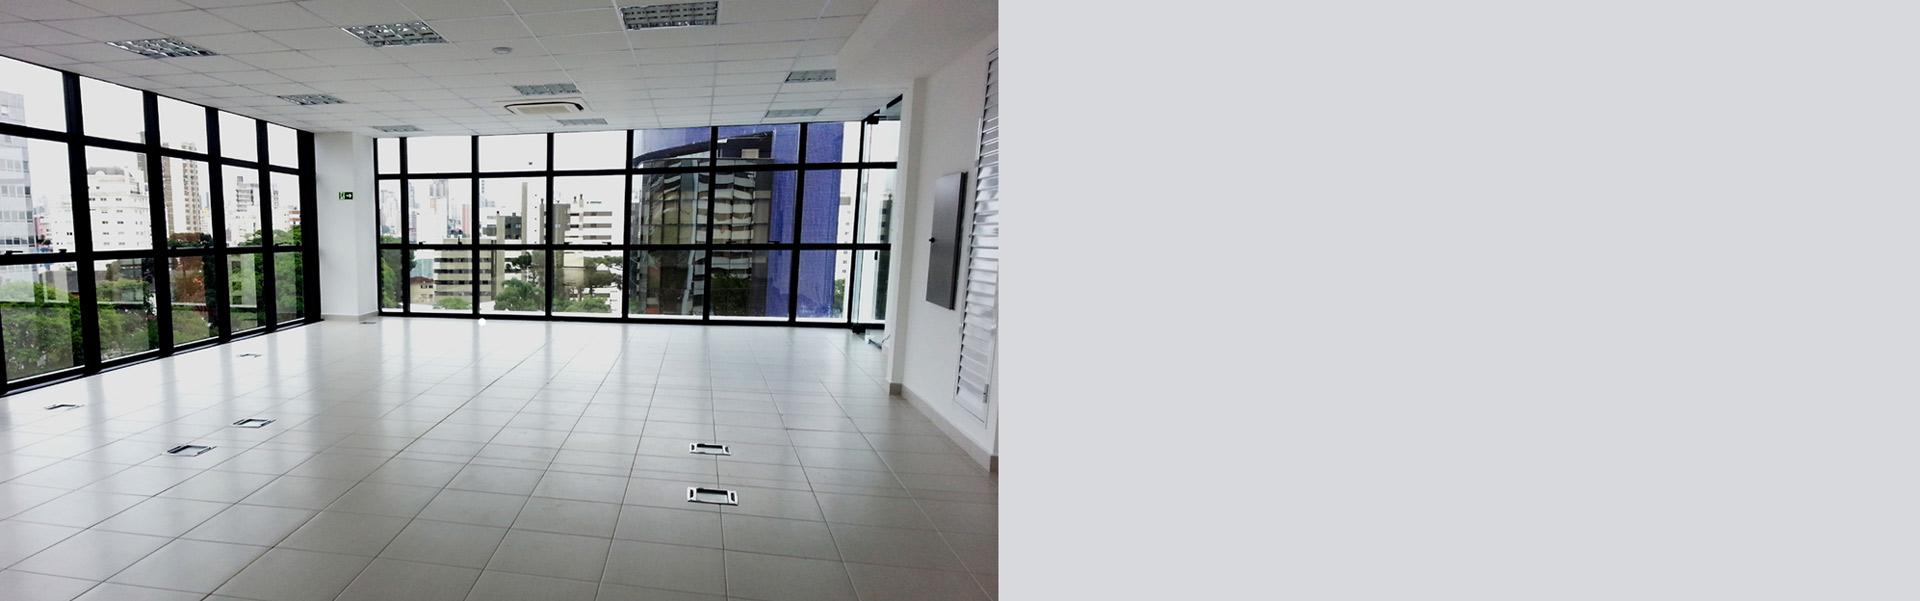 banner-pac-floor-piso-suspenso